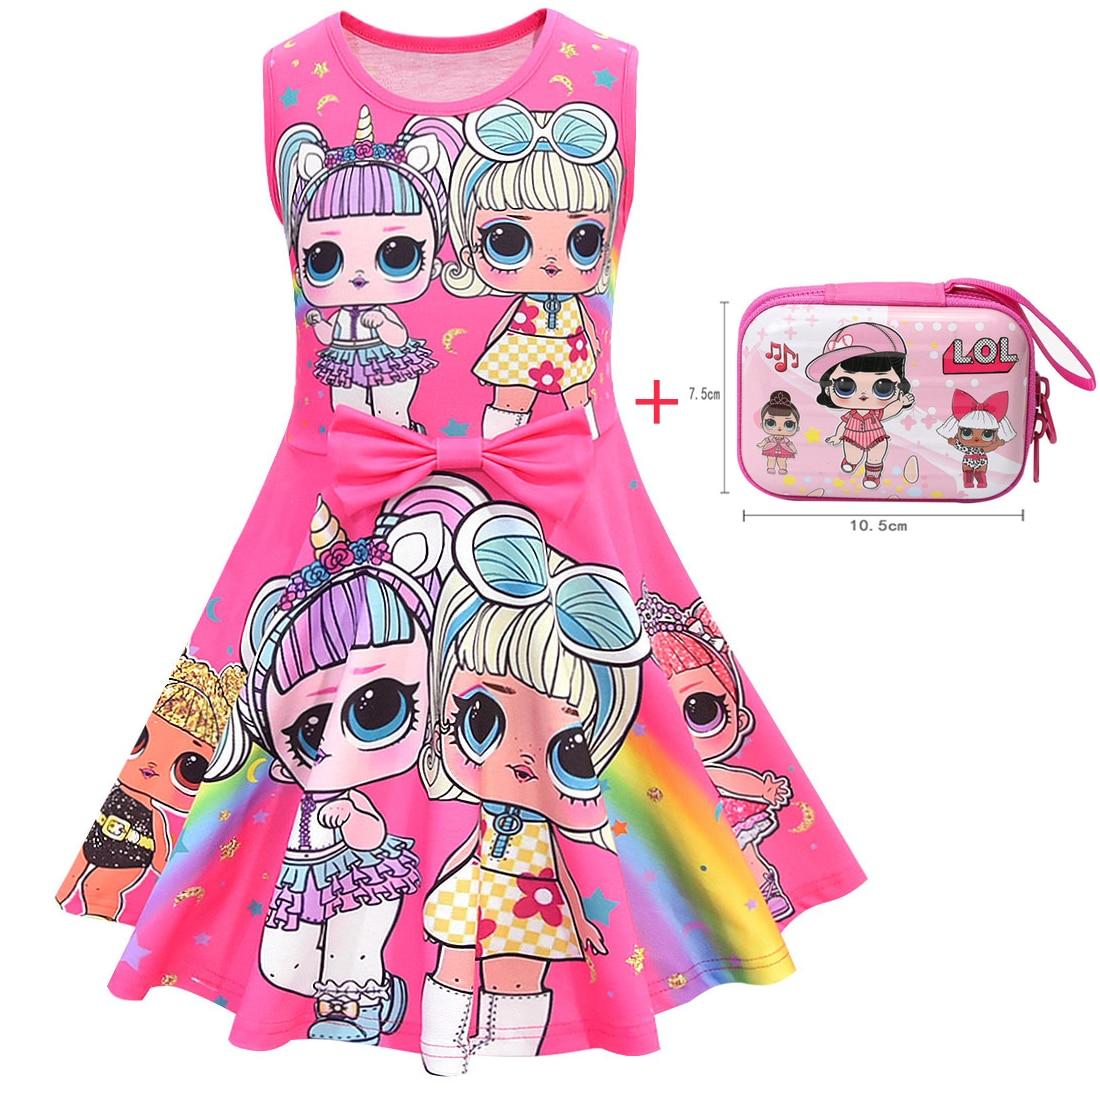 Girl Lol Dress 2019 New Girls Kids Cartoon Dolls Clothes Children's Sleeveless Vest Princess Dresses With Wallet For Girl Dress